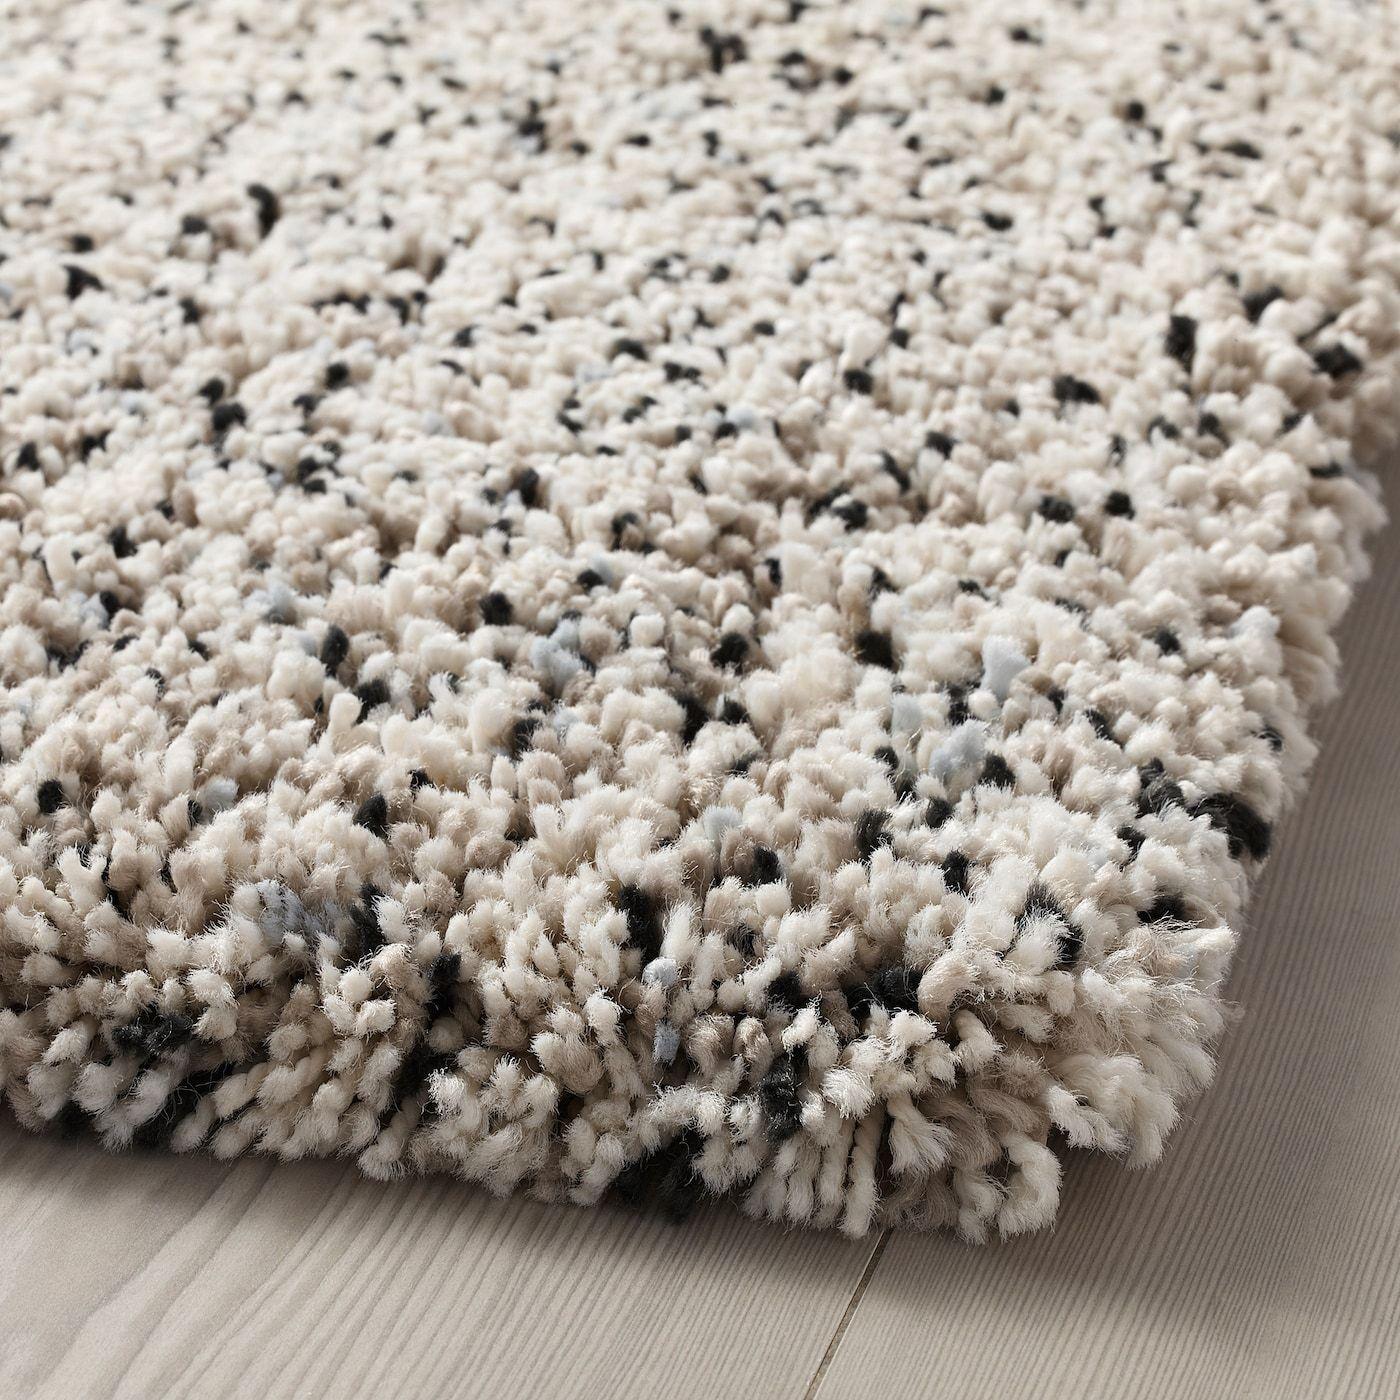 Vindum Rug High Pile White 6 7